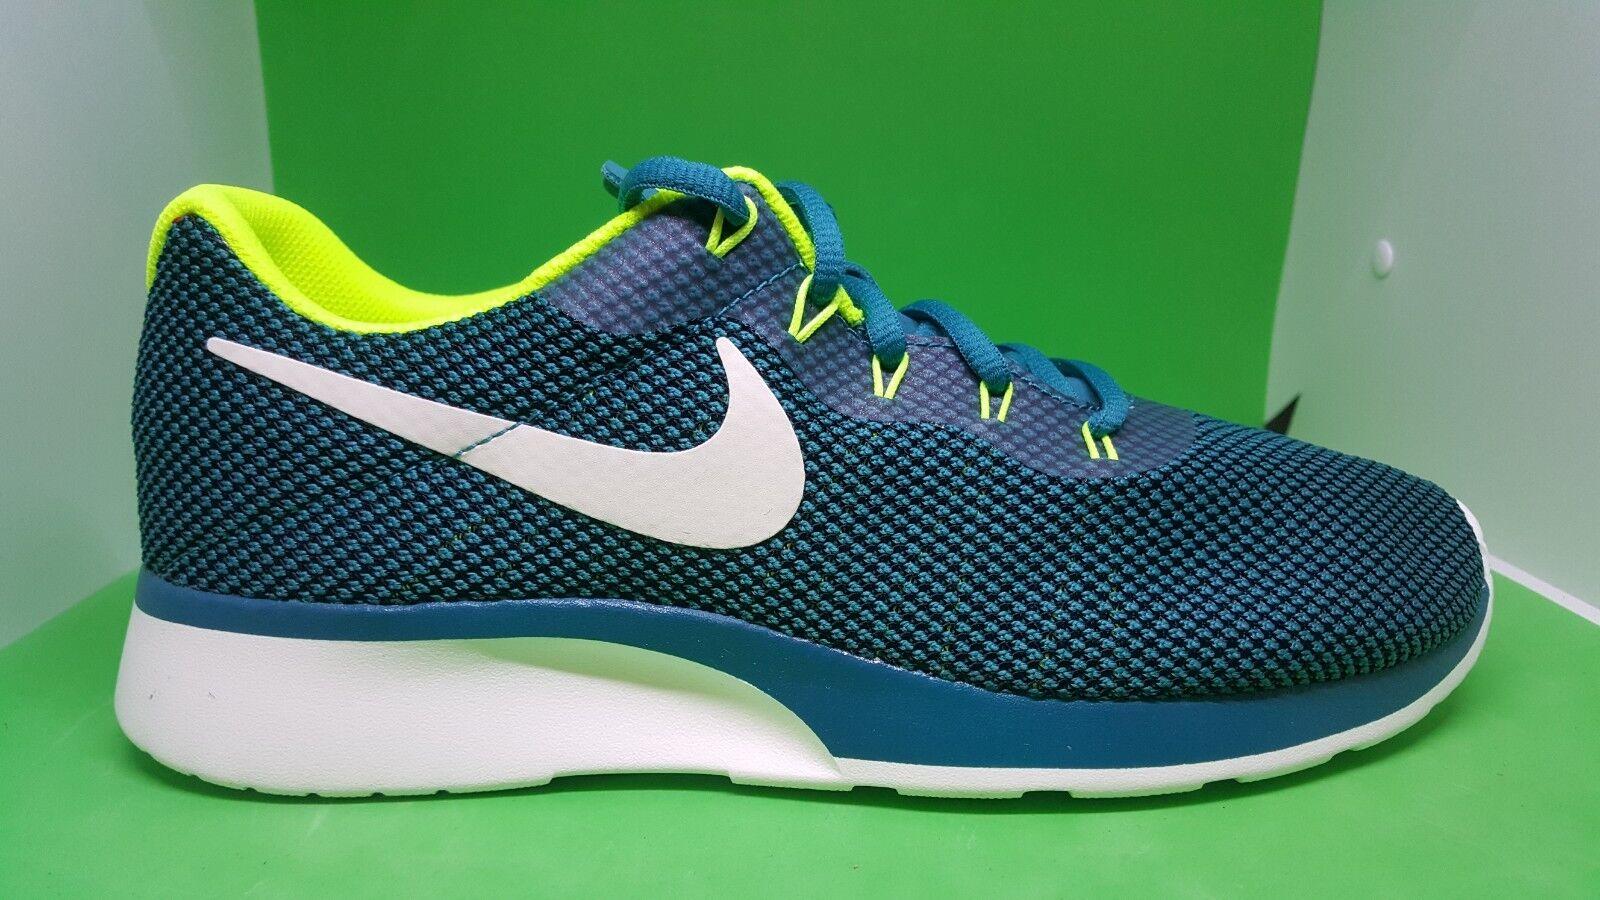 56ecf5fe0e Nike Tanjun Racer bluestery Volt White Men shoes Sneakers 921669-400 Sail  Running ntjvgg2803-Athletic Shoes